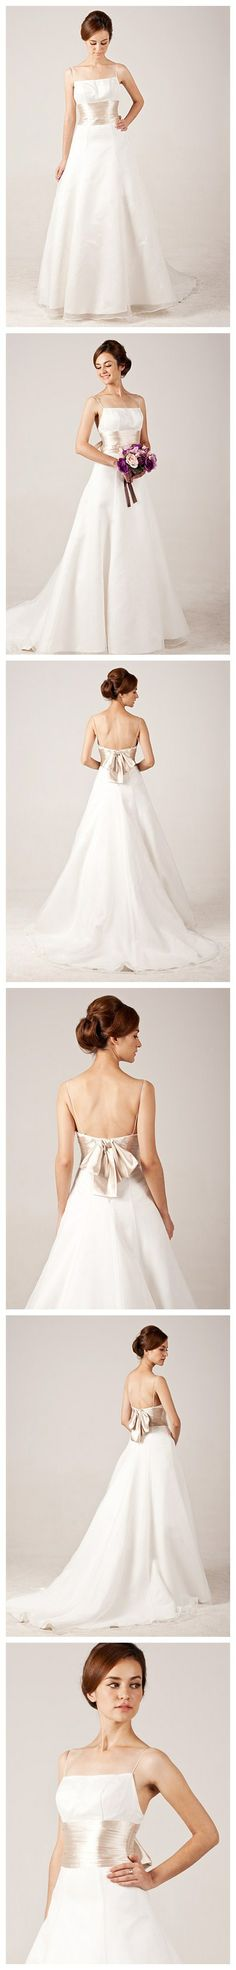 Graceful Spaghetti Straps Organza Wedding Dress with Sashes/Ribbon